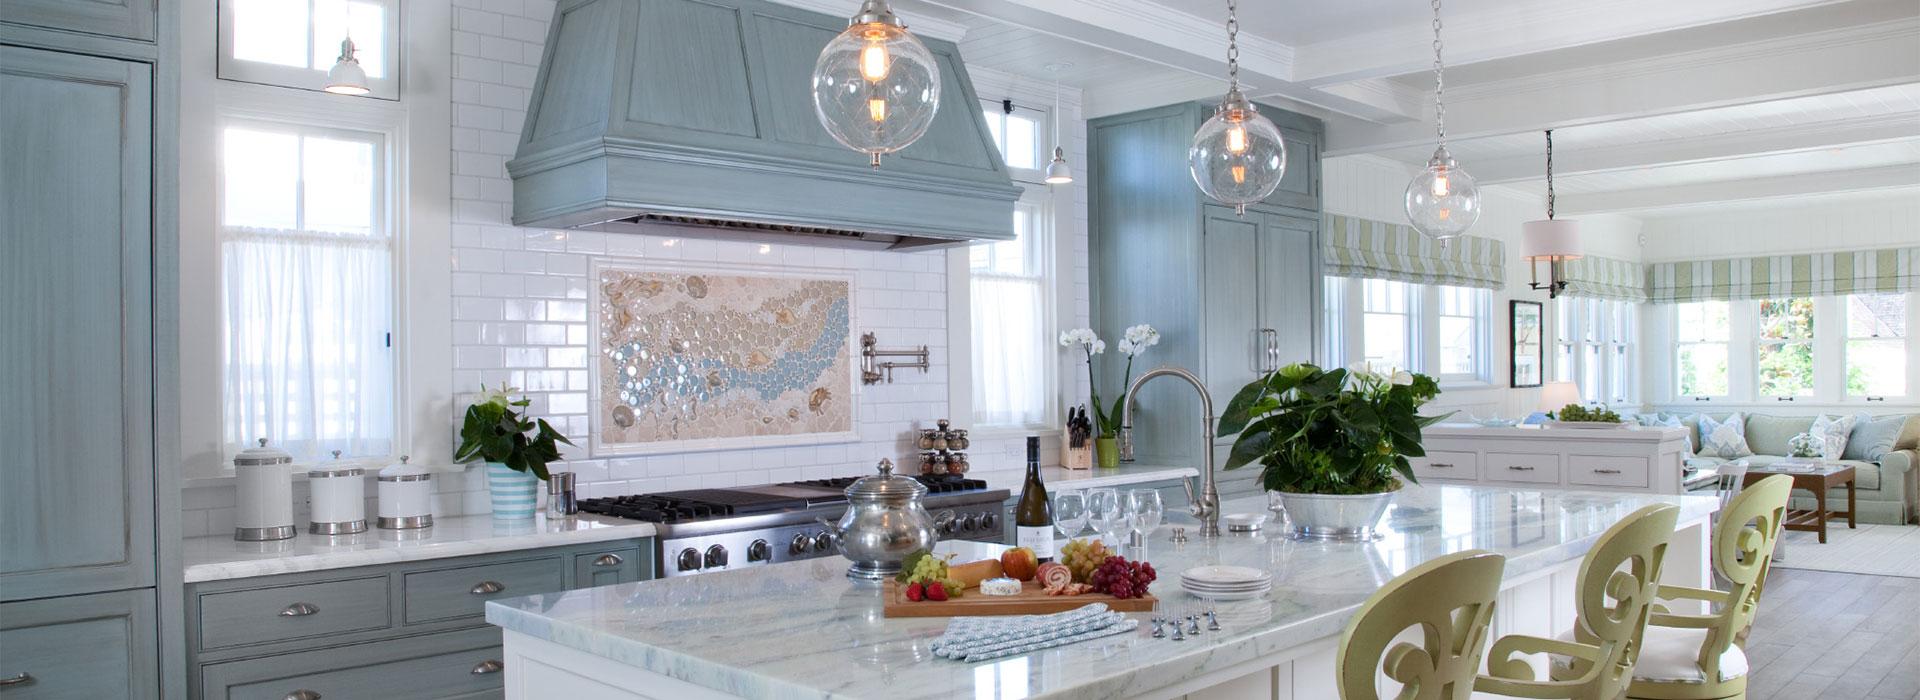 Ross Thiele & Son   San Diego Interior Design s1-1 Home